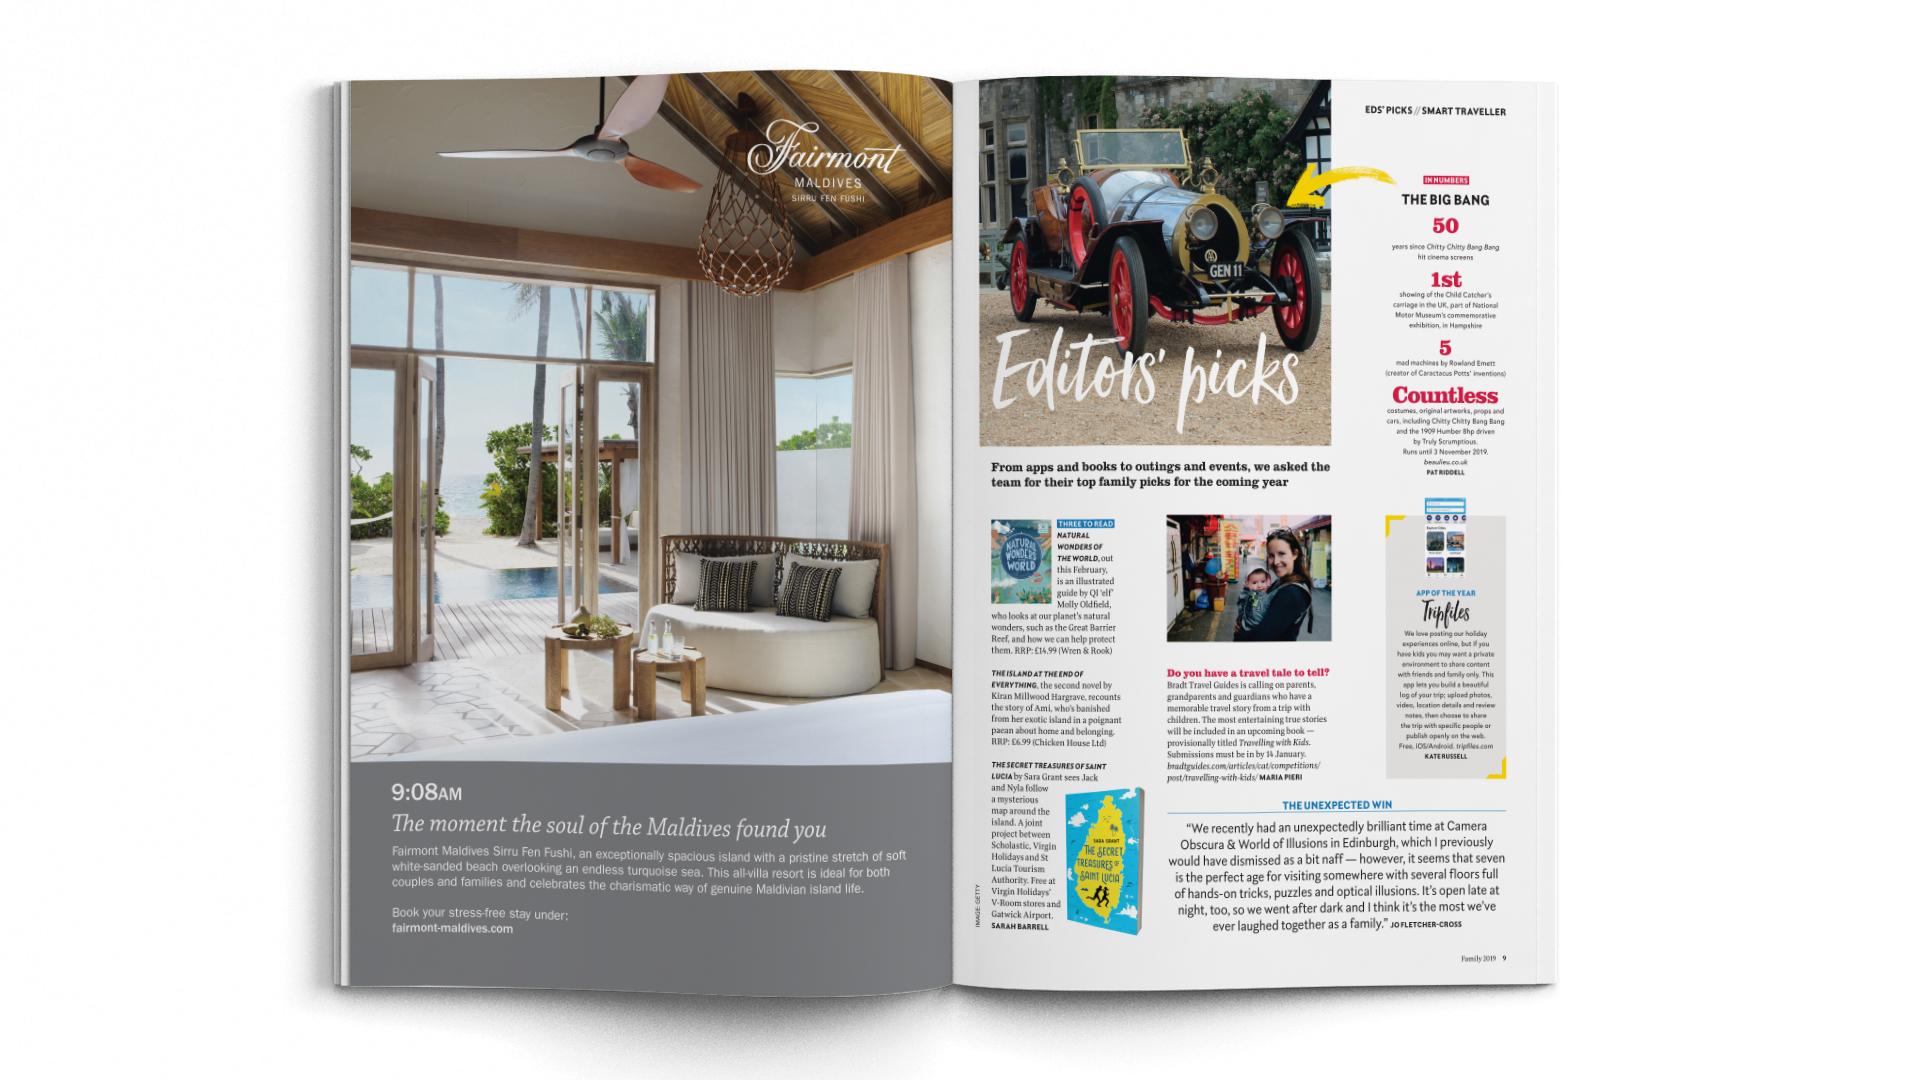 A4-Magazine-DPS-NGT-FAMILY-Eds-picks